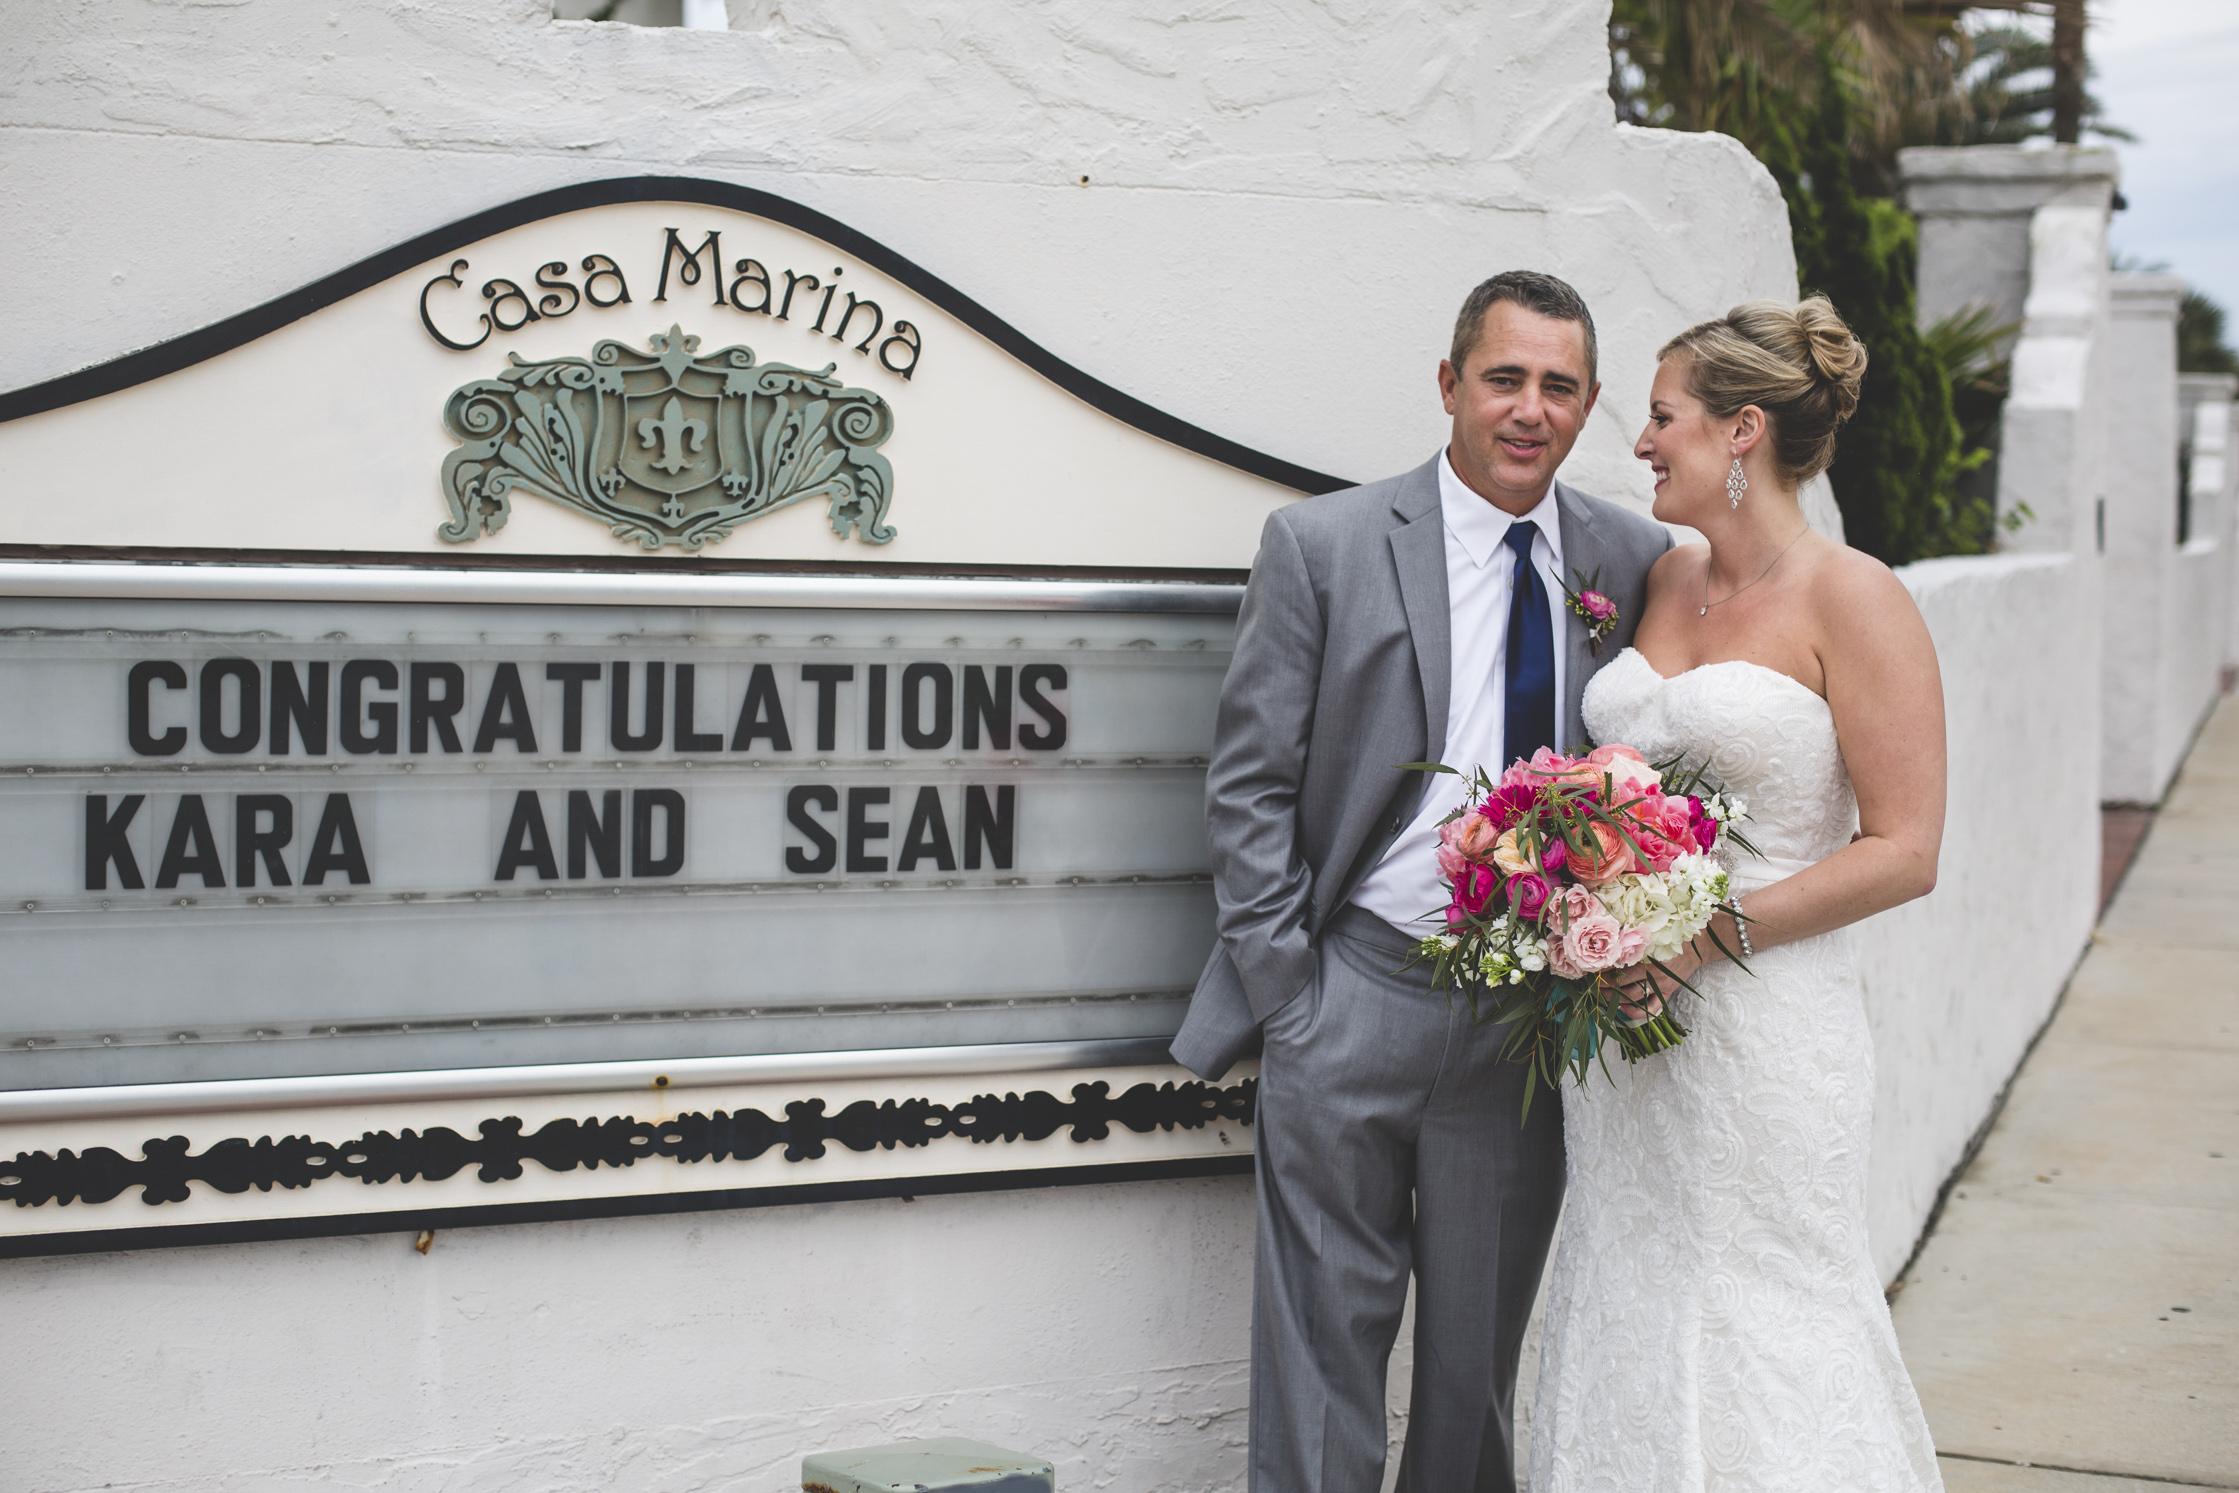 adam-szarmack-casa-marina-wedding-photographer-jacksonville-beach-florida-25.jpg